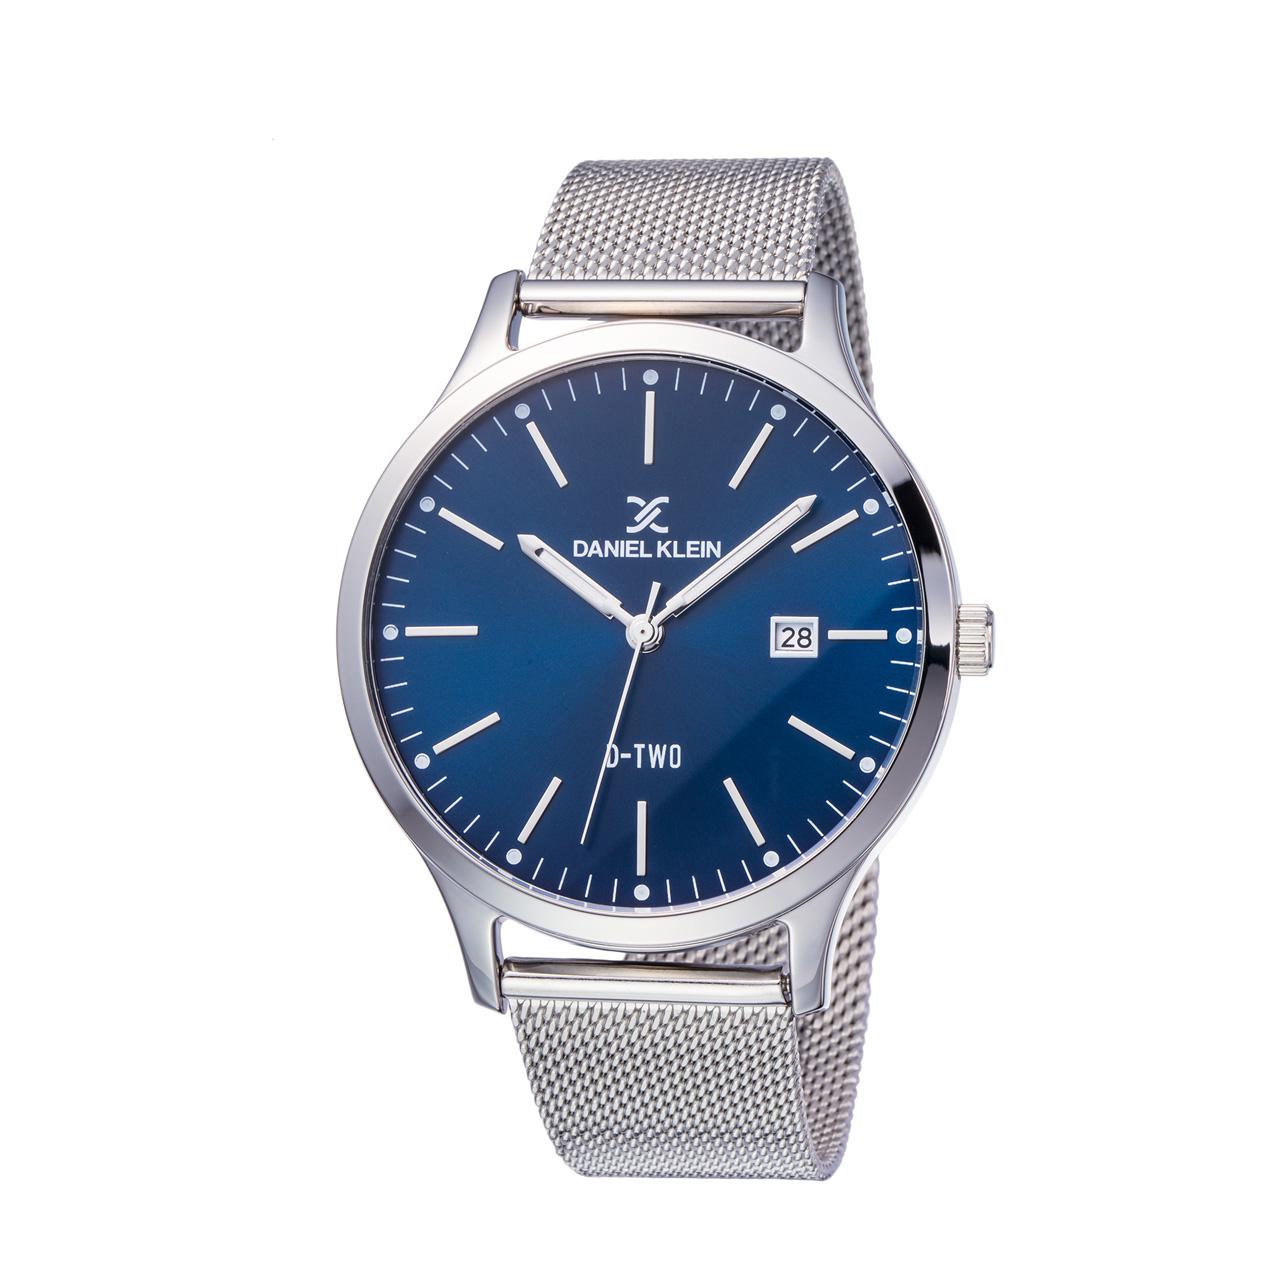 Ceas pentru barbati, Daniel Klein D Two, DK11921-5